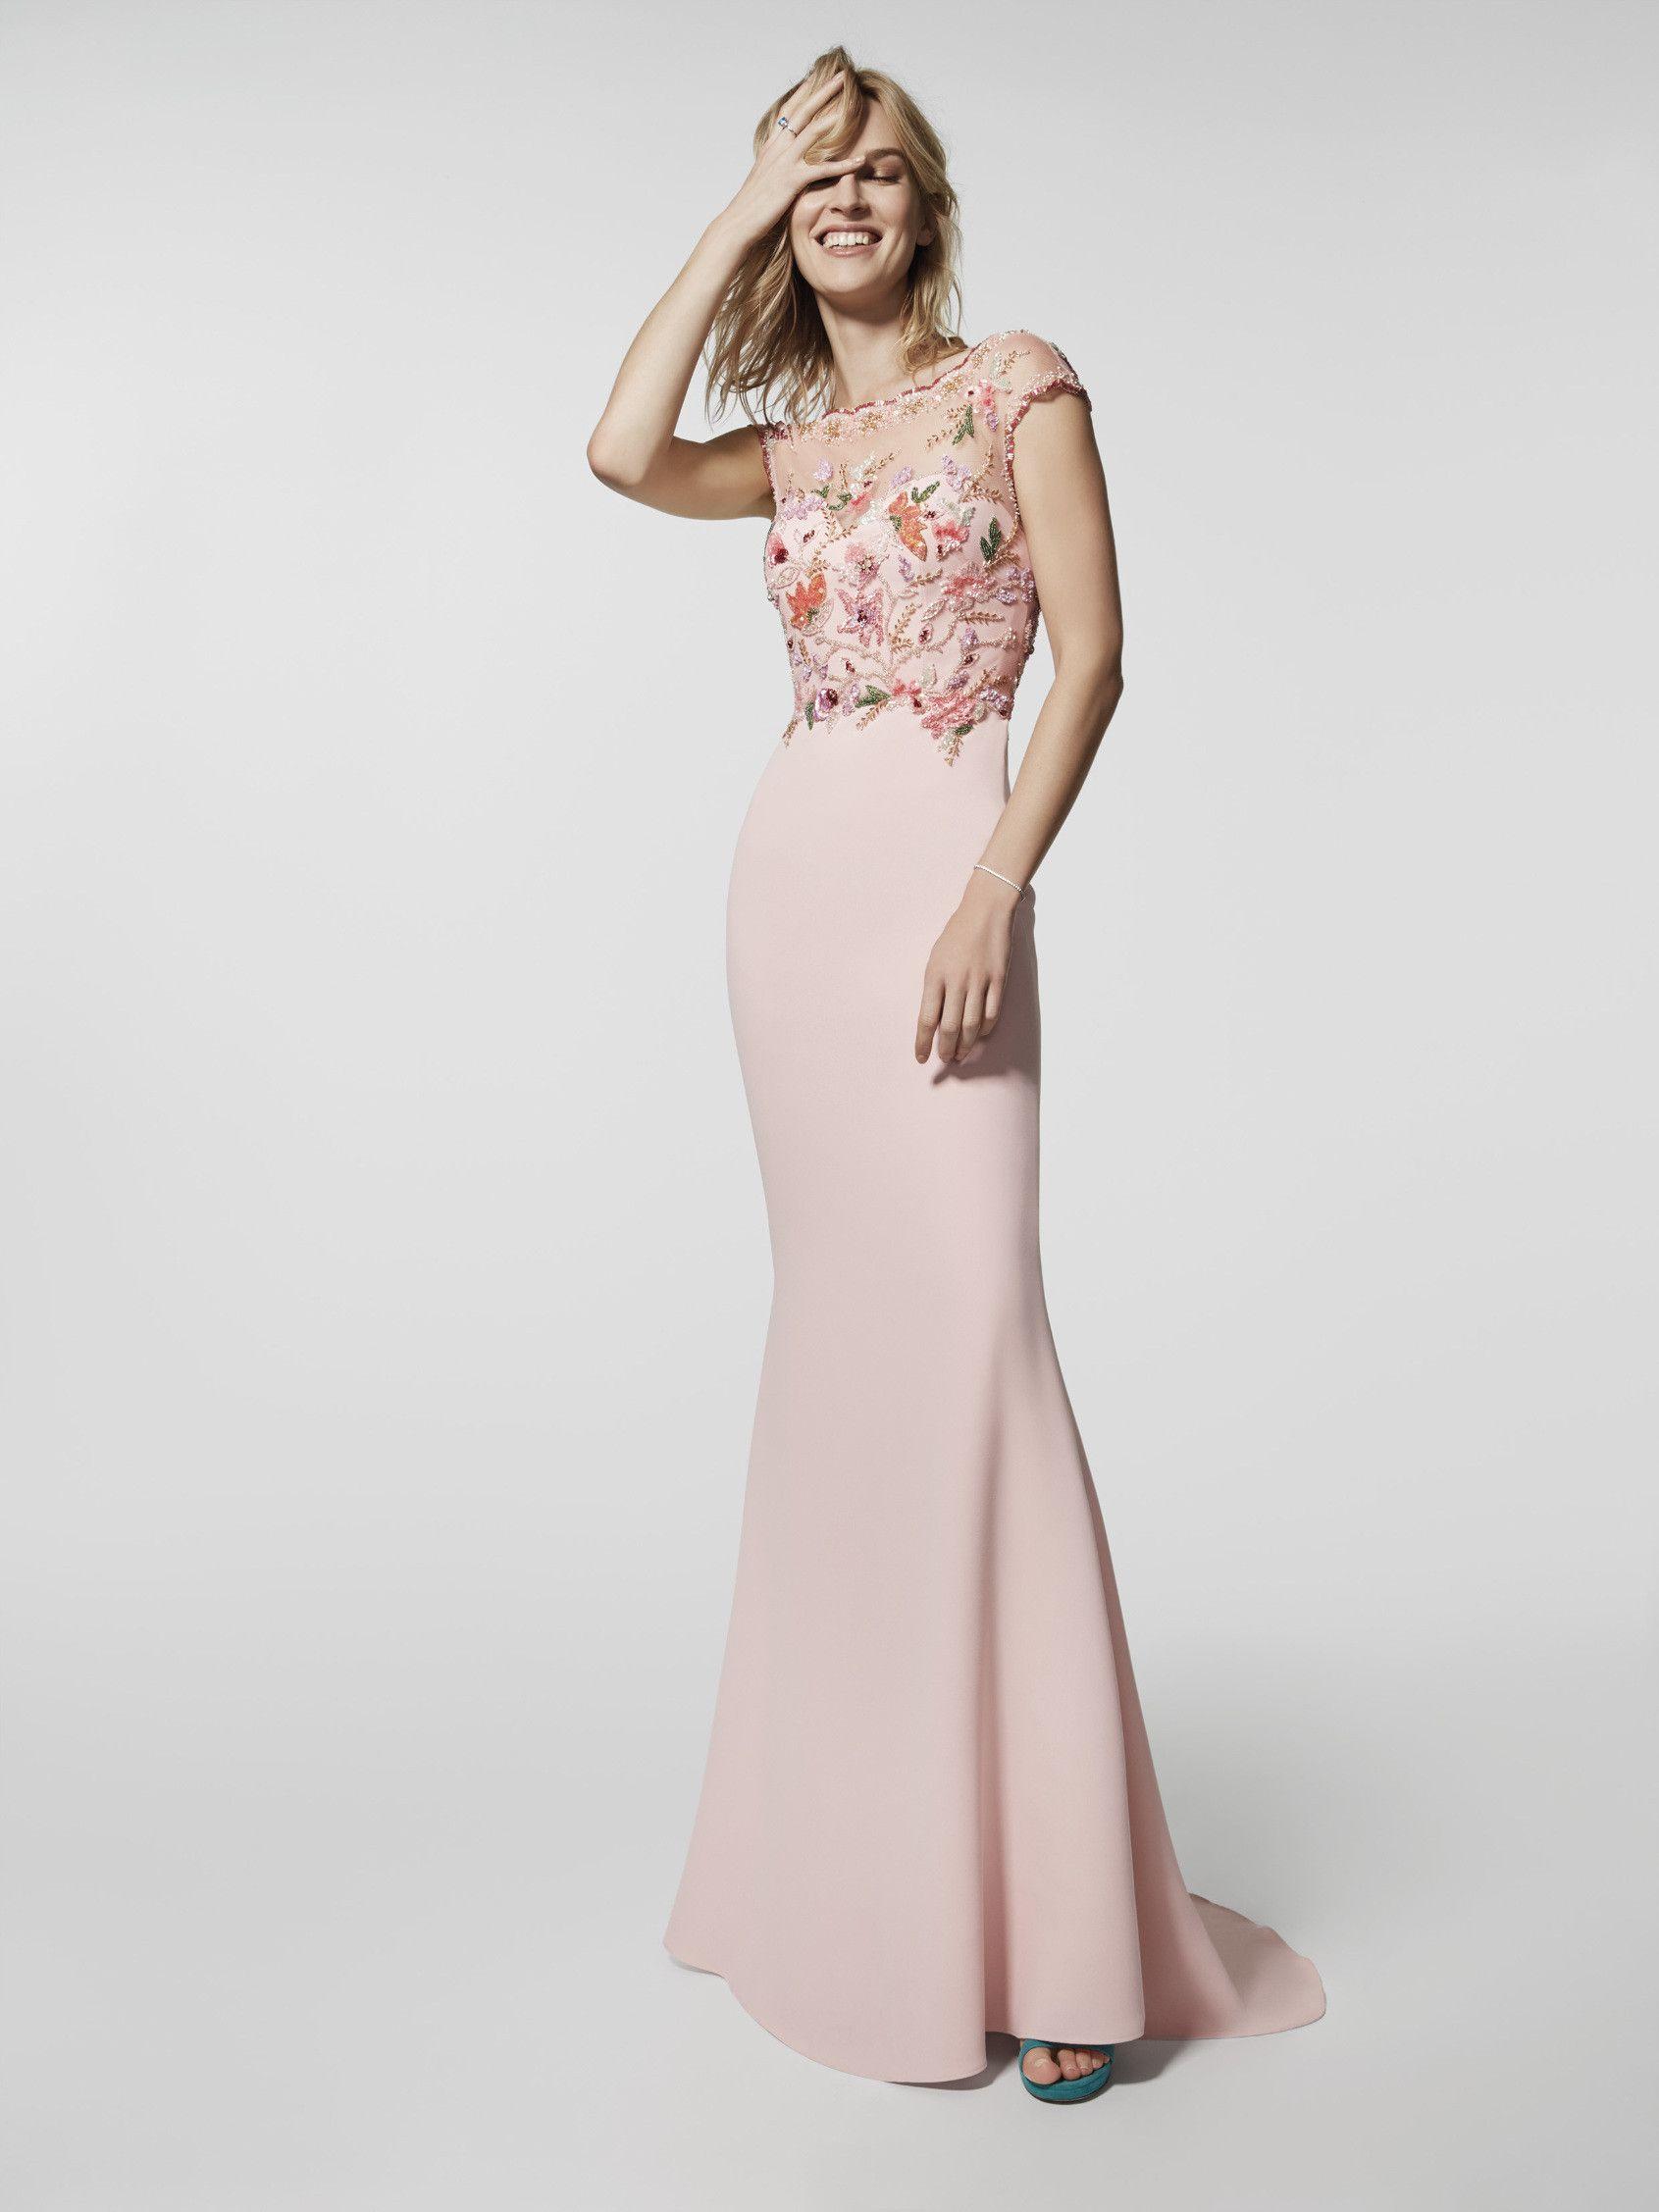 Photo pale pink cocktail dress (62017) | Evening dresses | Pinterest ...